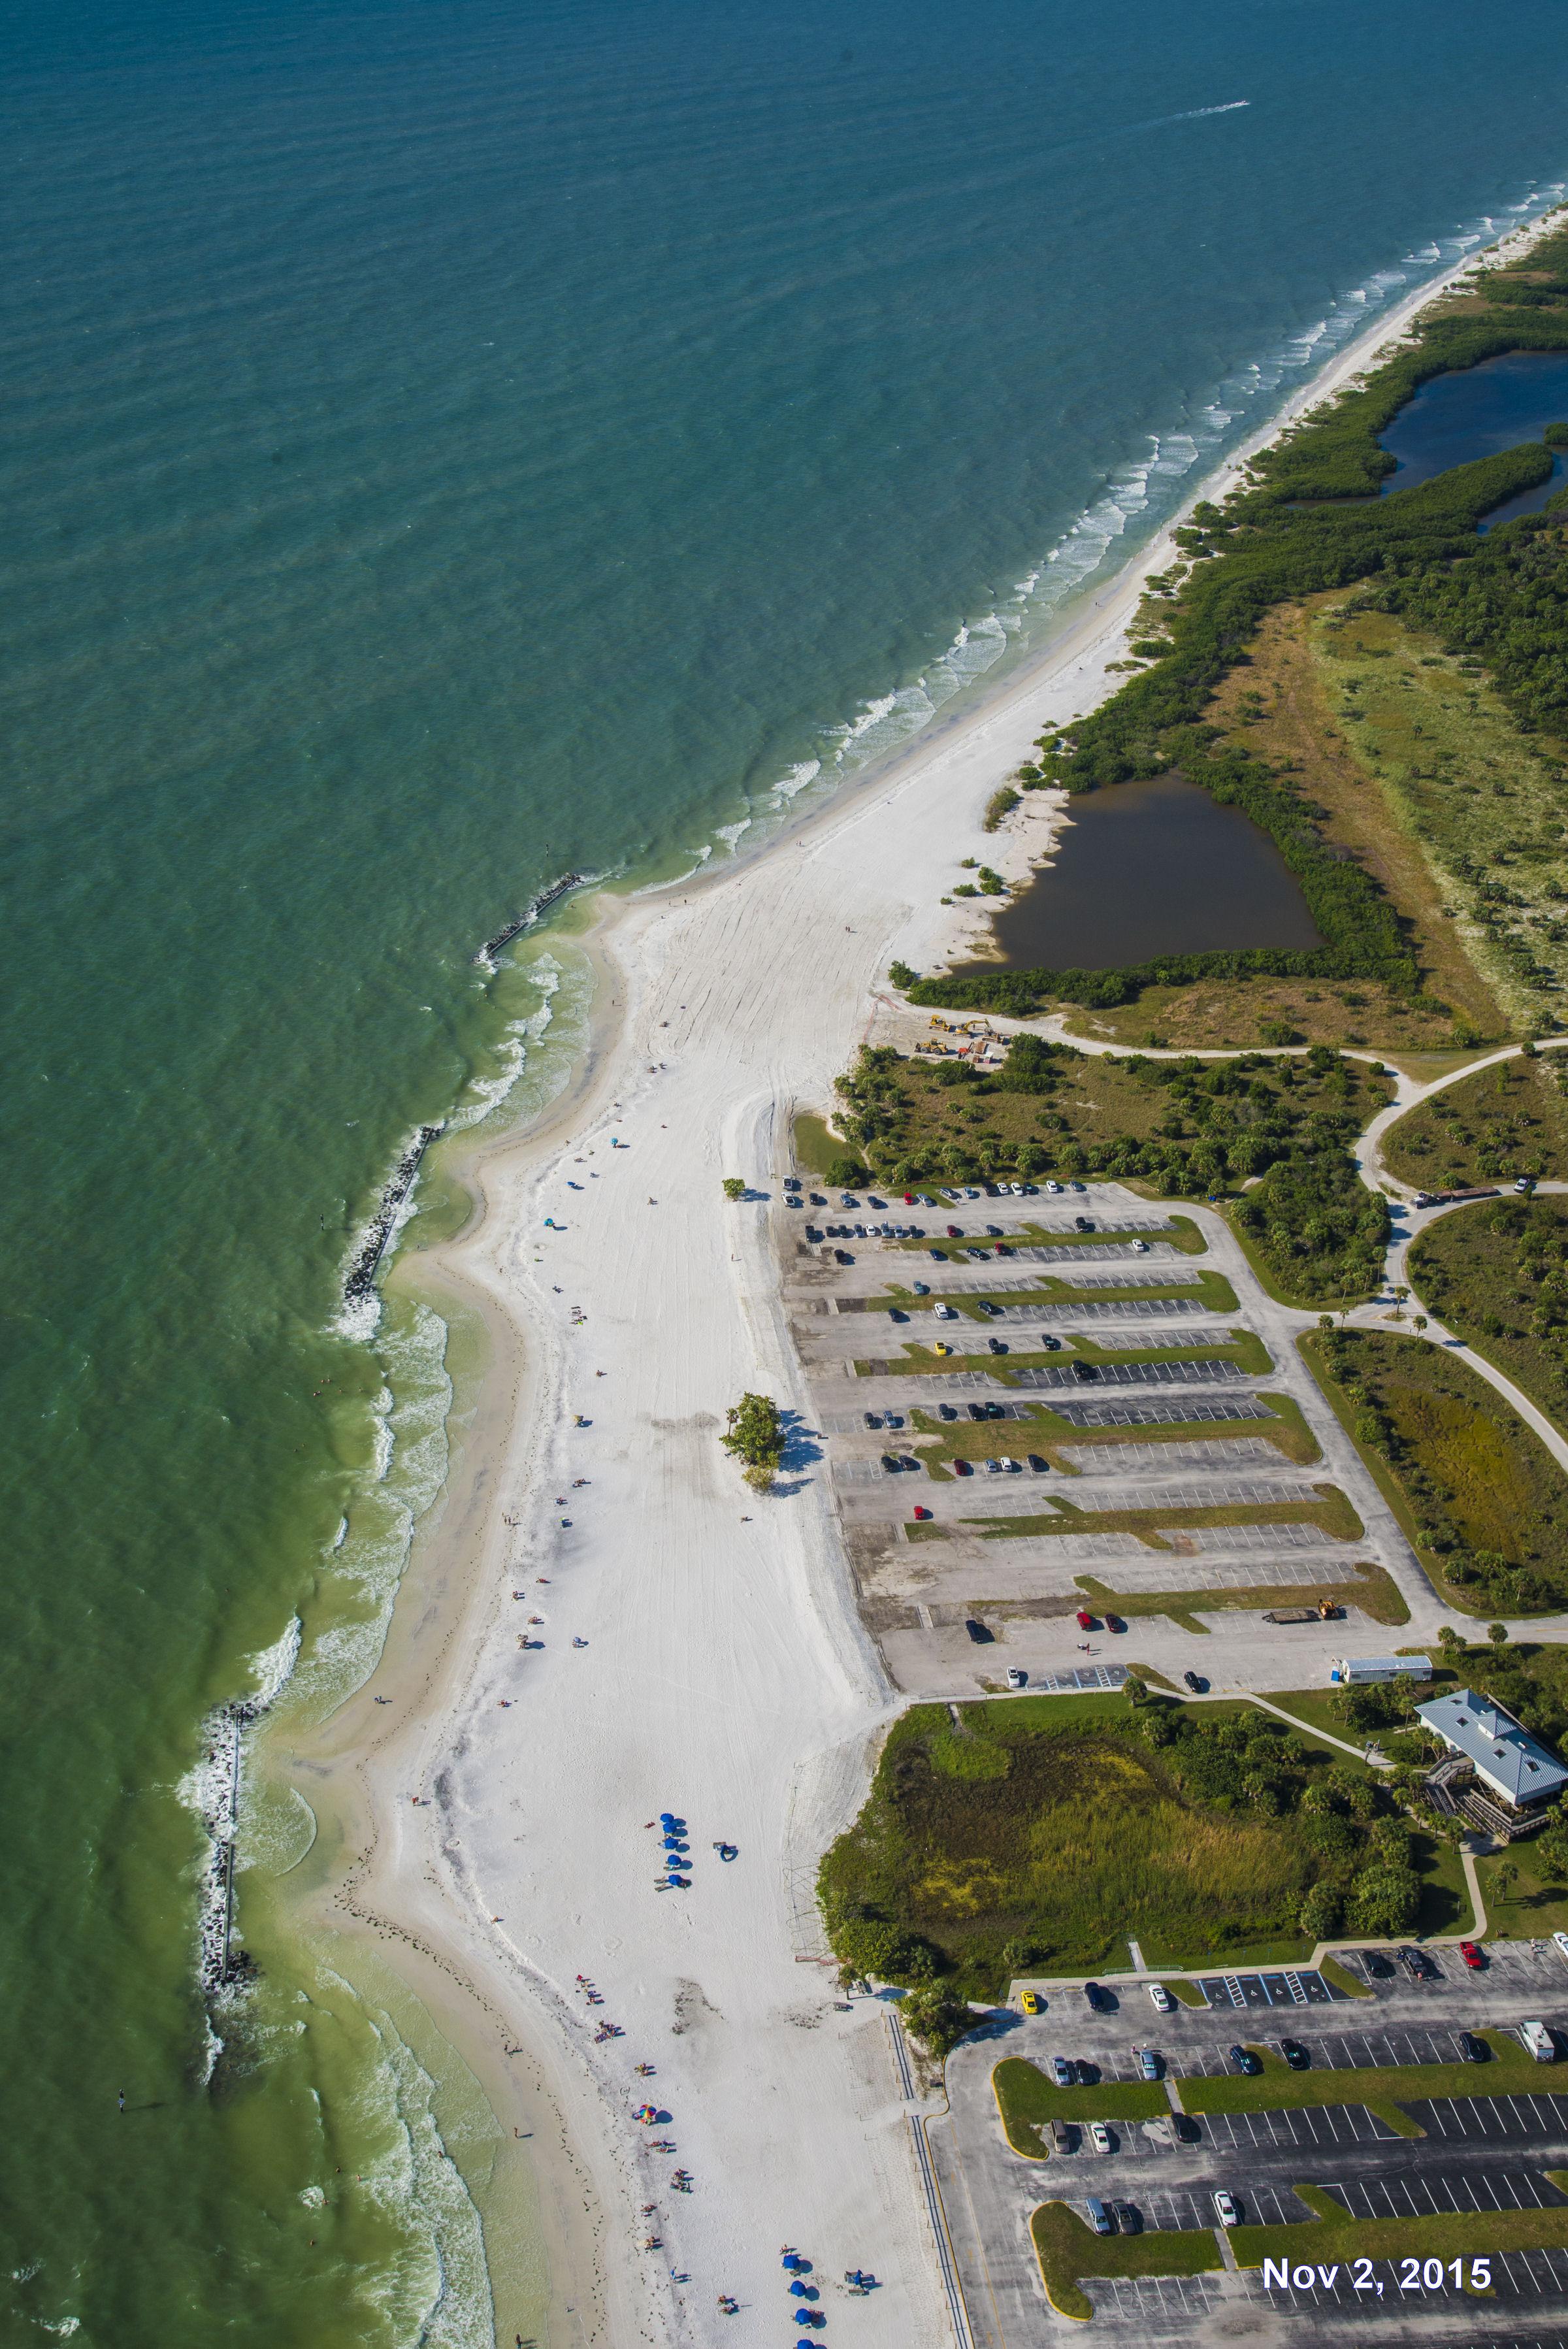 Honeymoon Island 11-2-15 0279.jpg